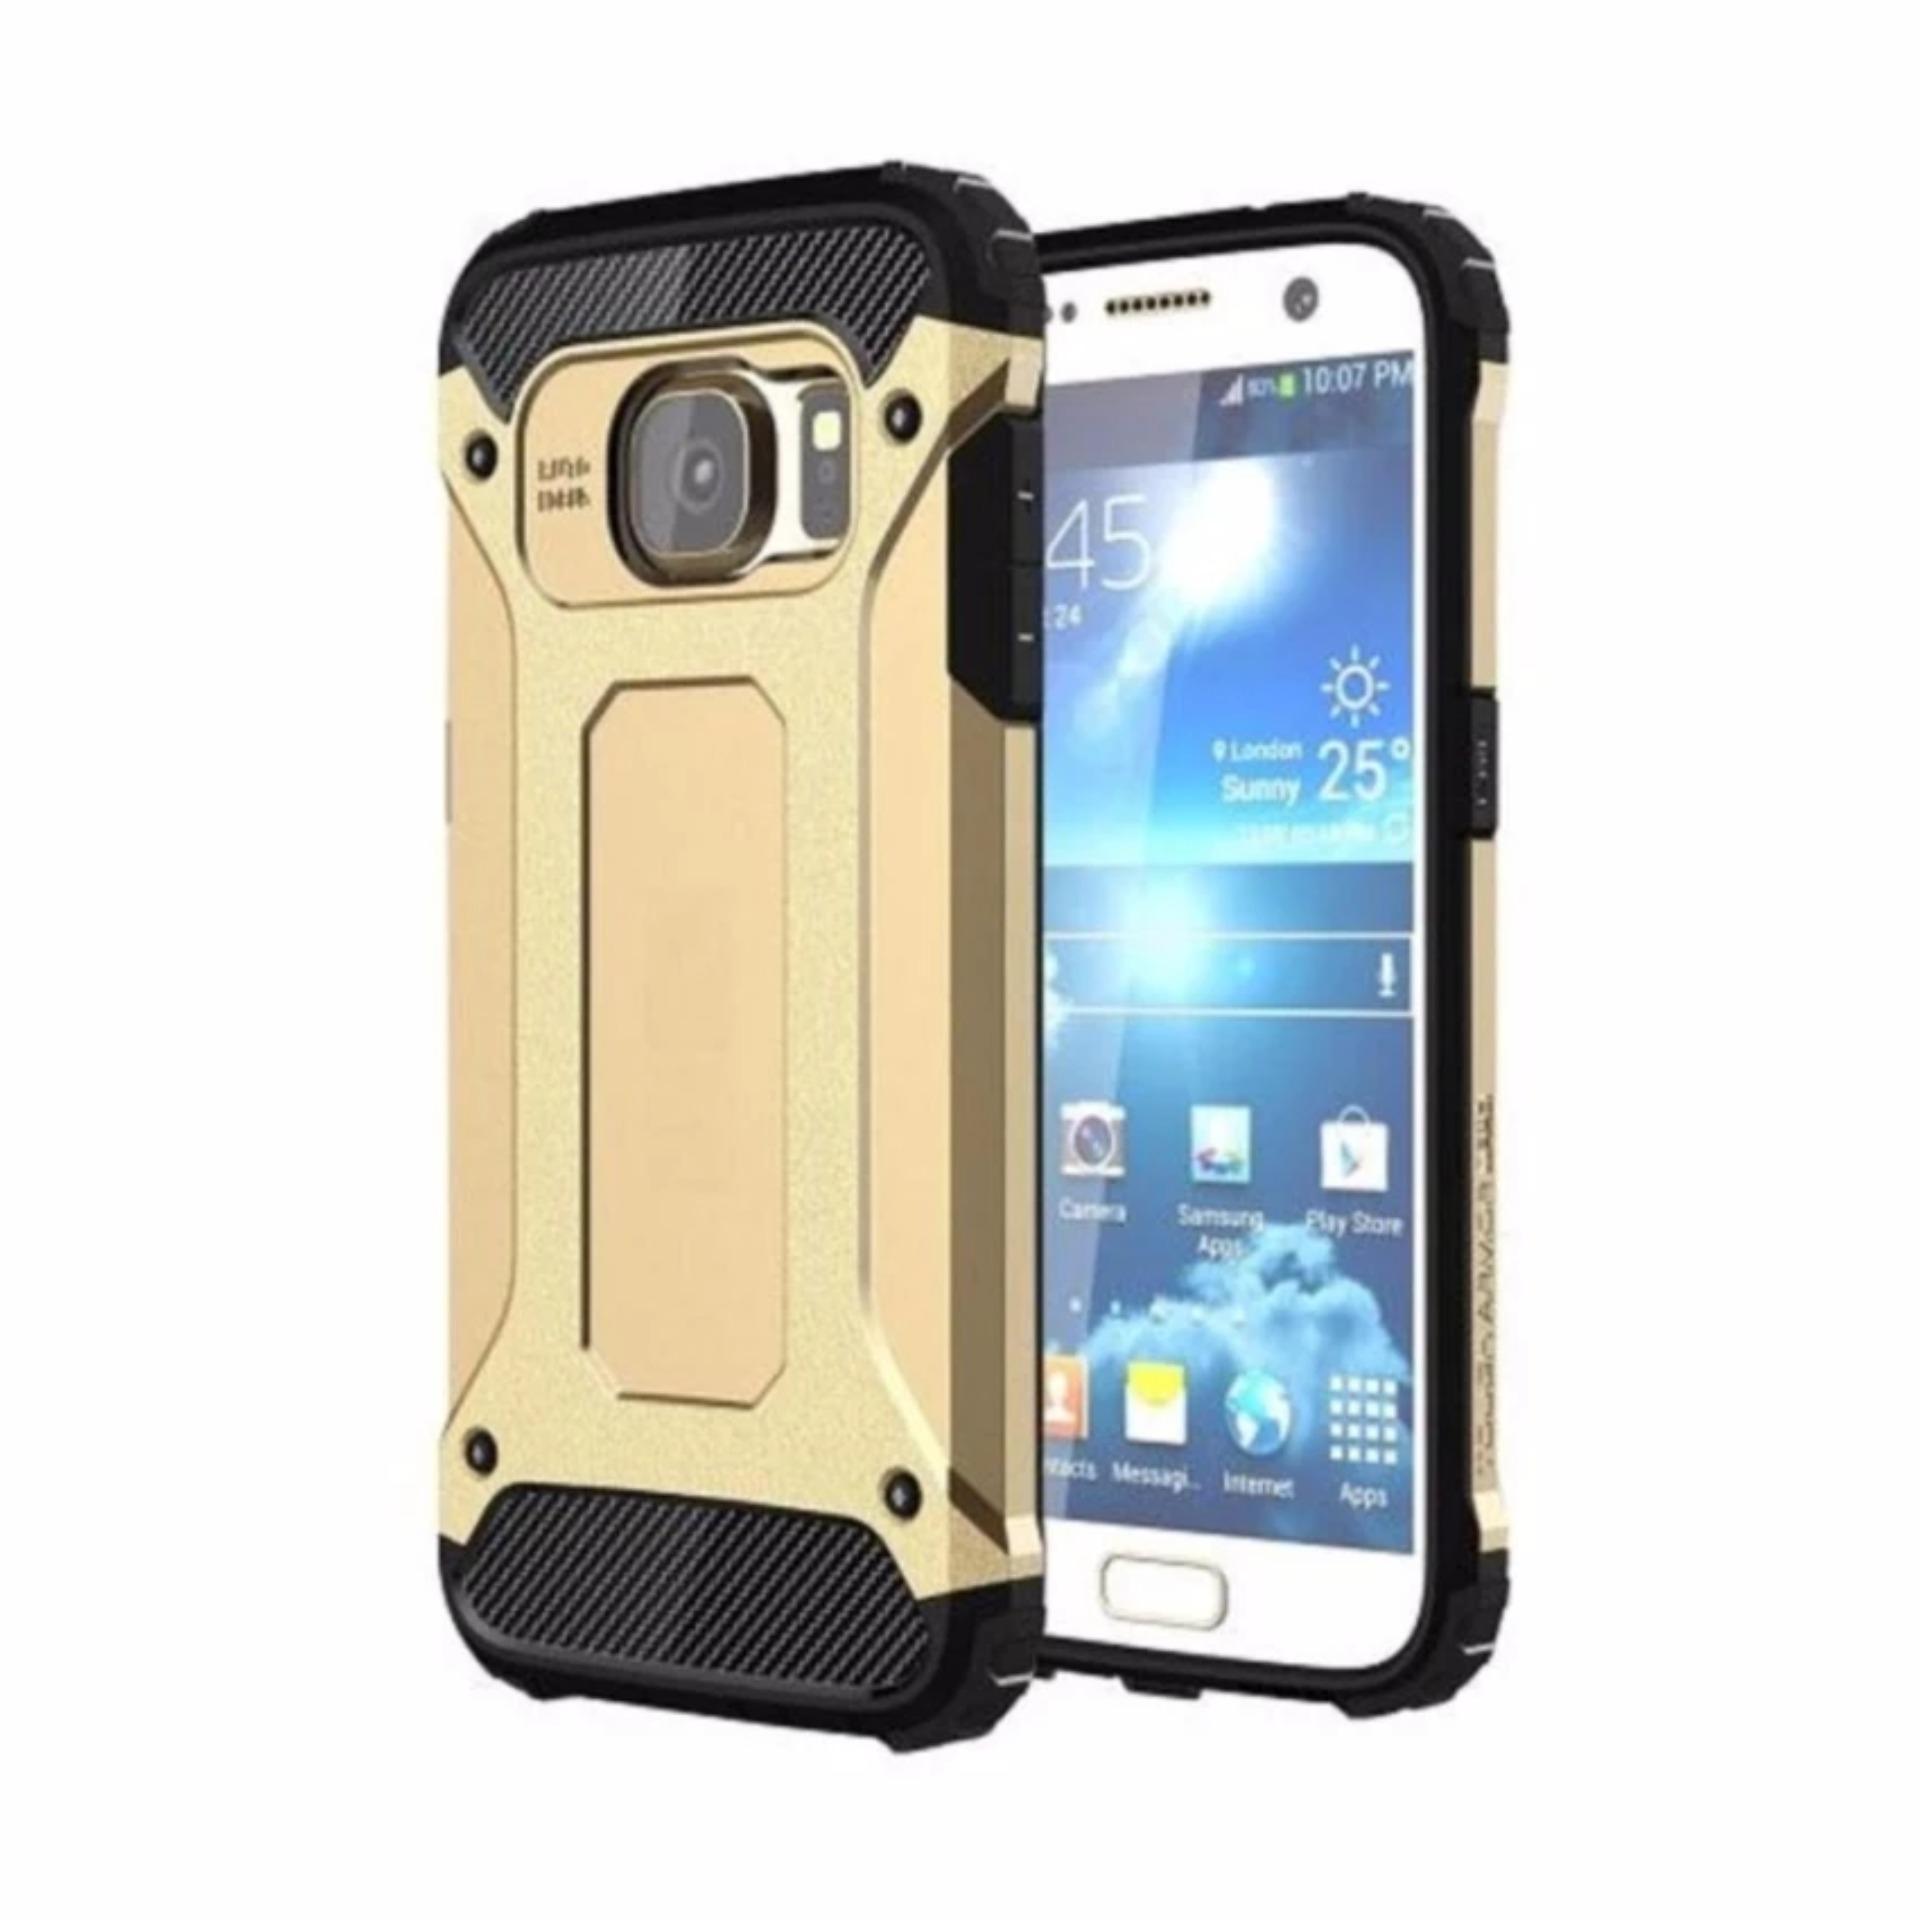 Casing Handphone Iron Robot Hardcase Casing for Samsung Galaxy A3 2017